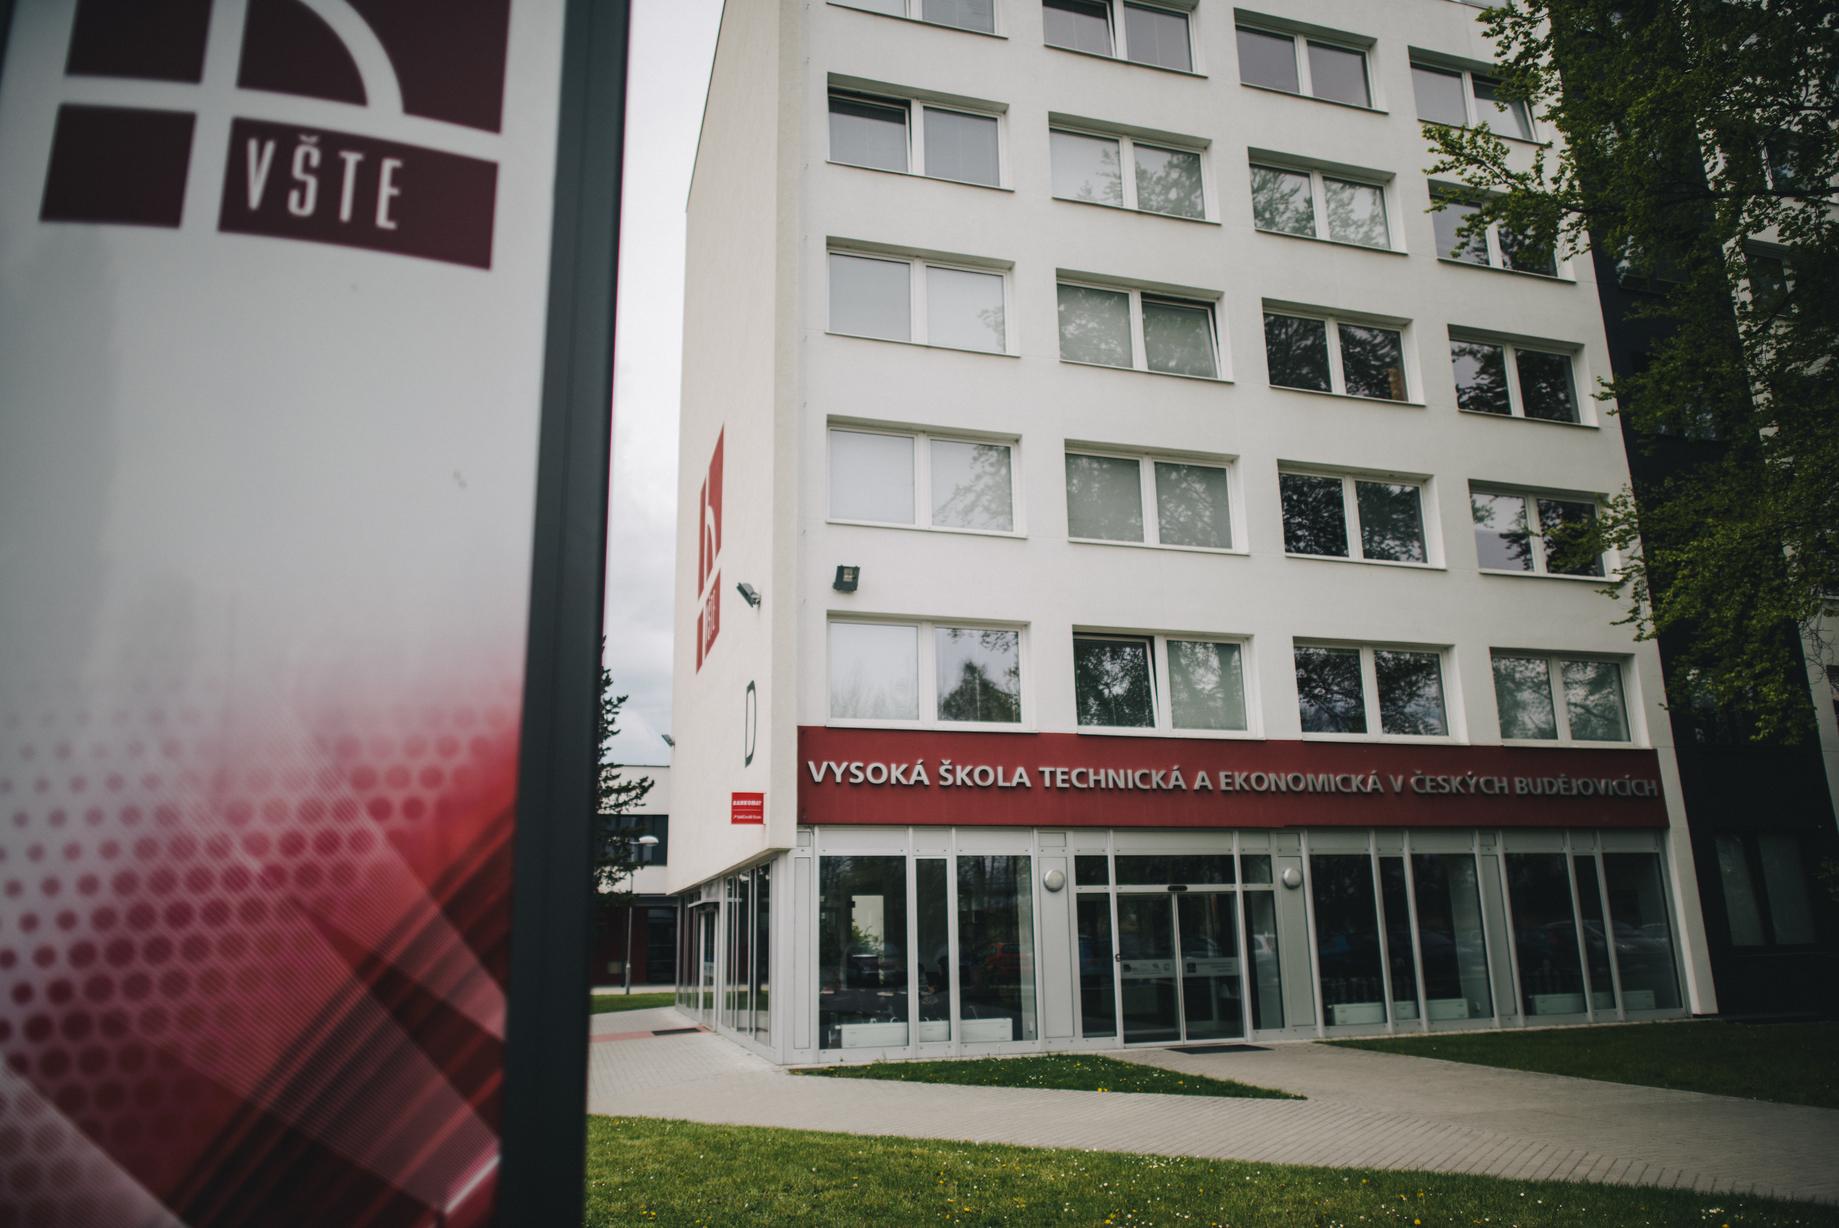 vste-vysoka-skola-ceske-budejovice-budova